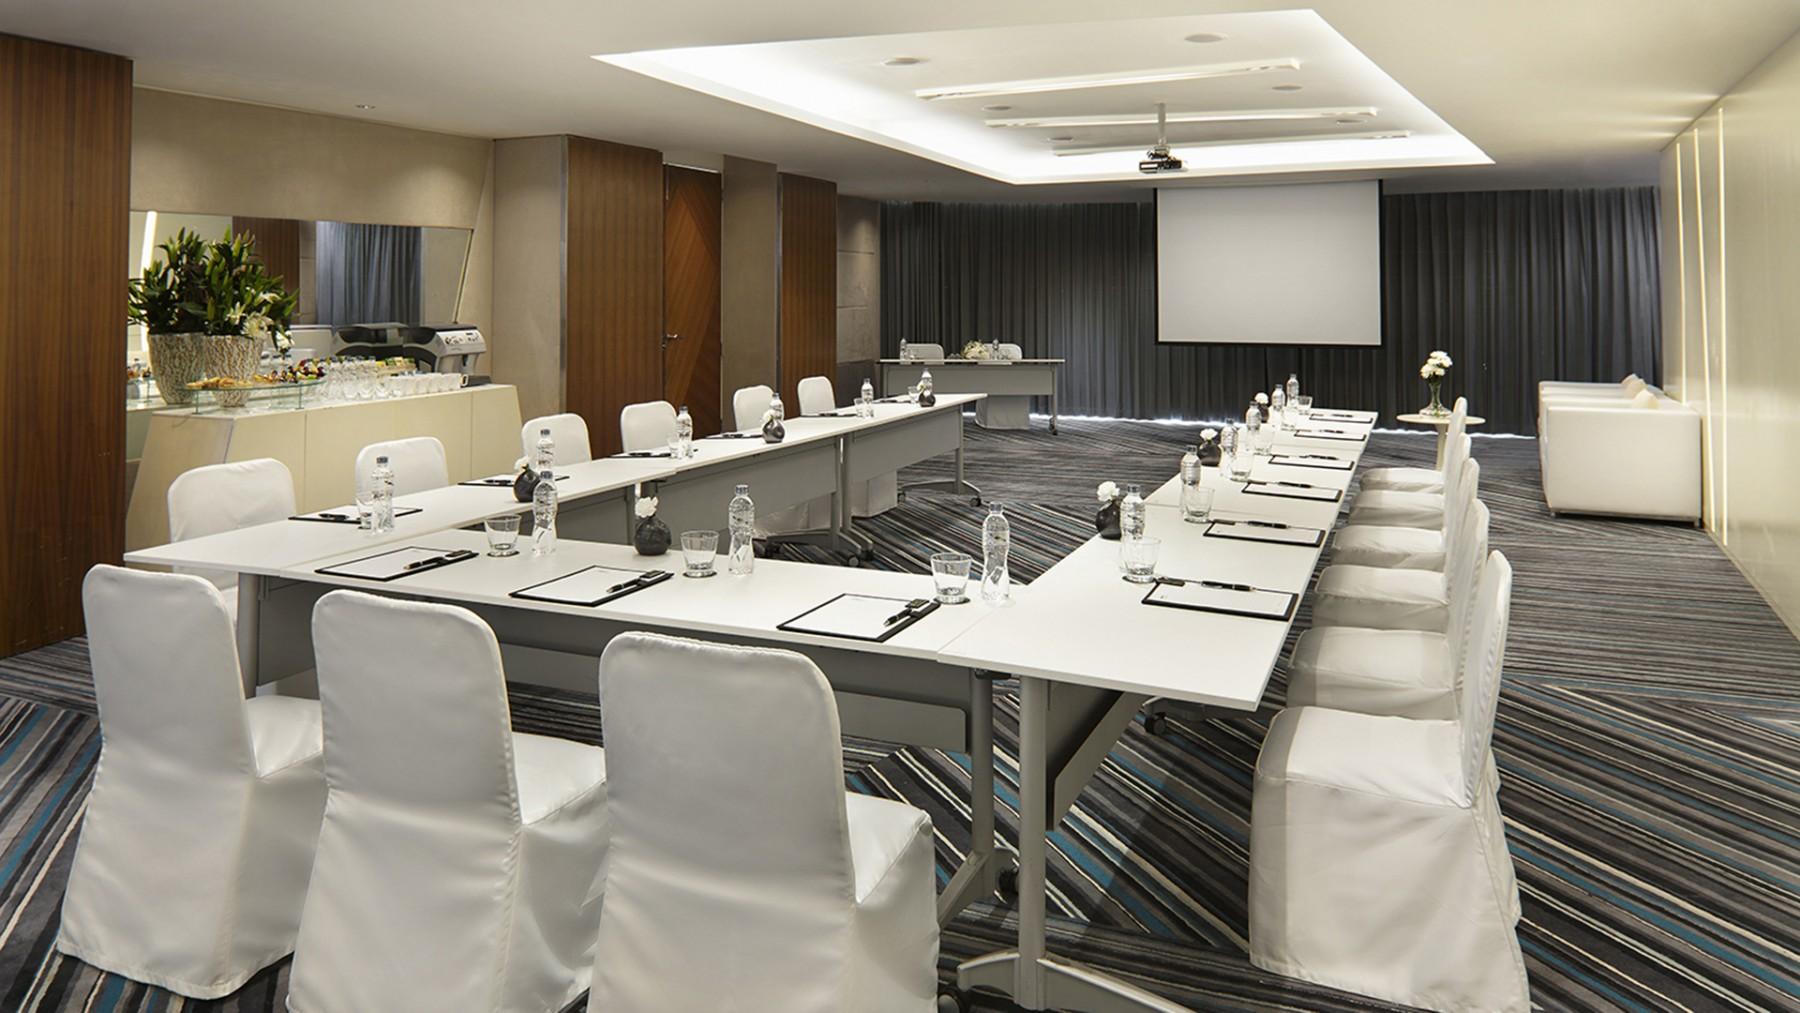 Pattaya-Meeting-Room-041.jpg